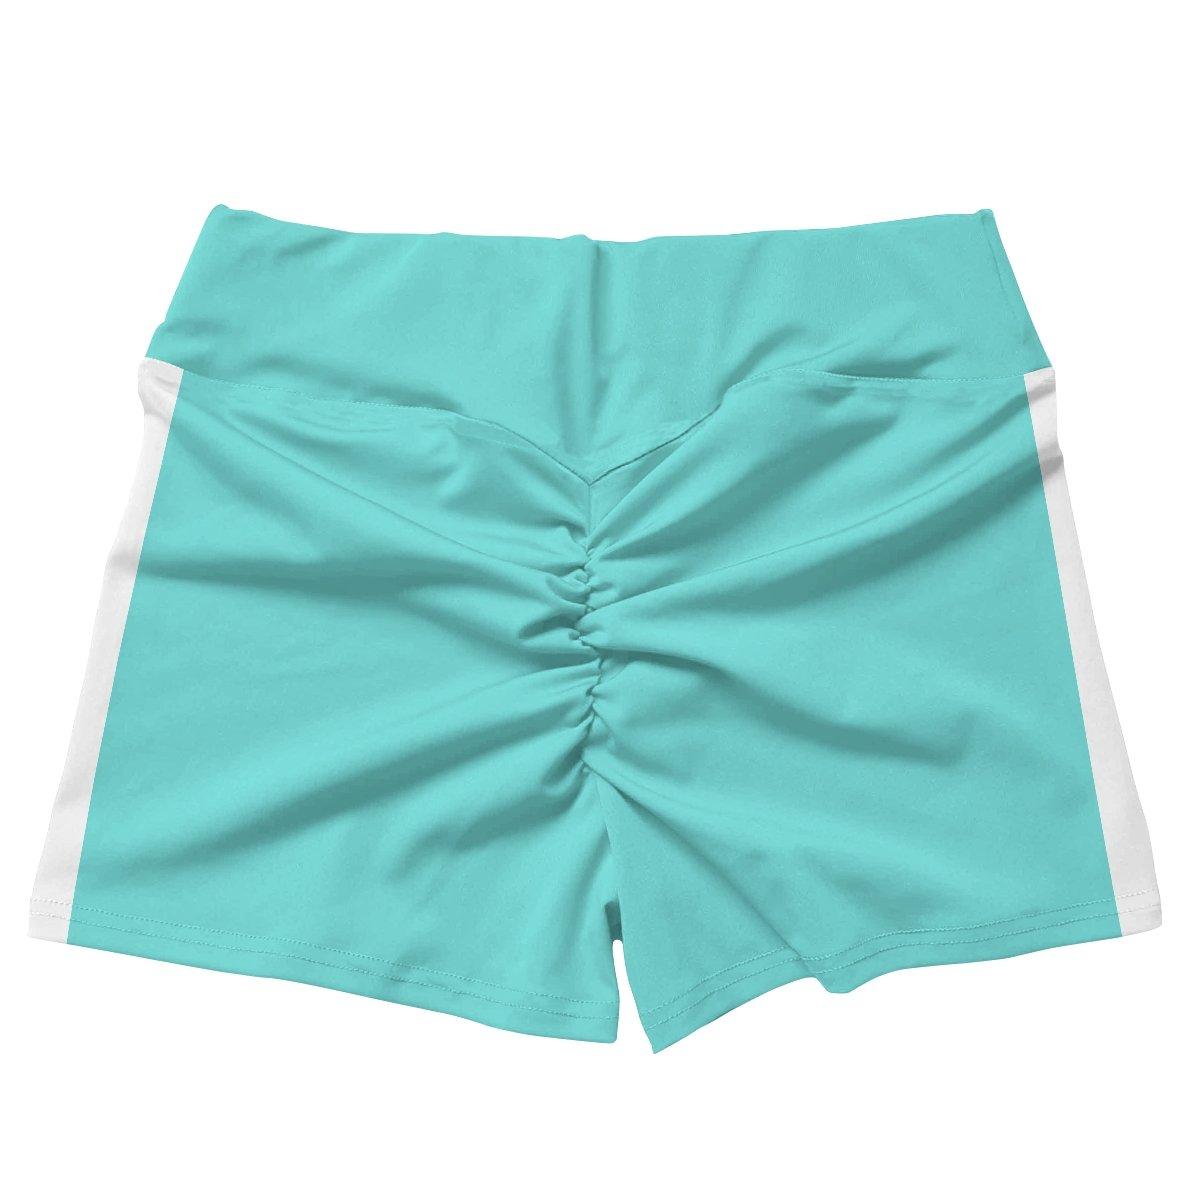 team aoba johsai active wear set 852968 - Anime Swimsuits